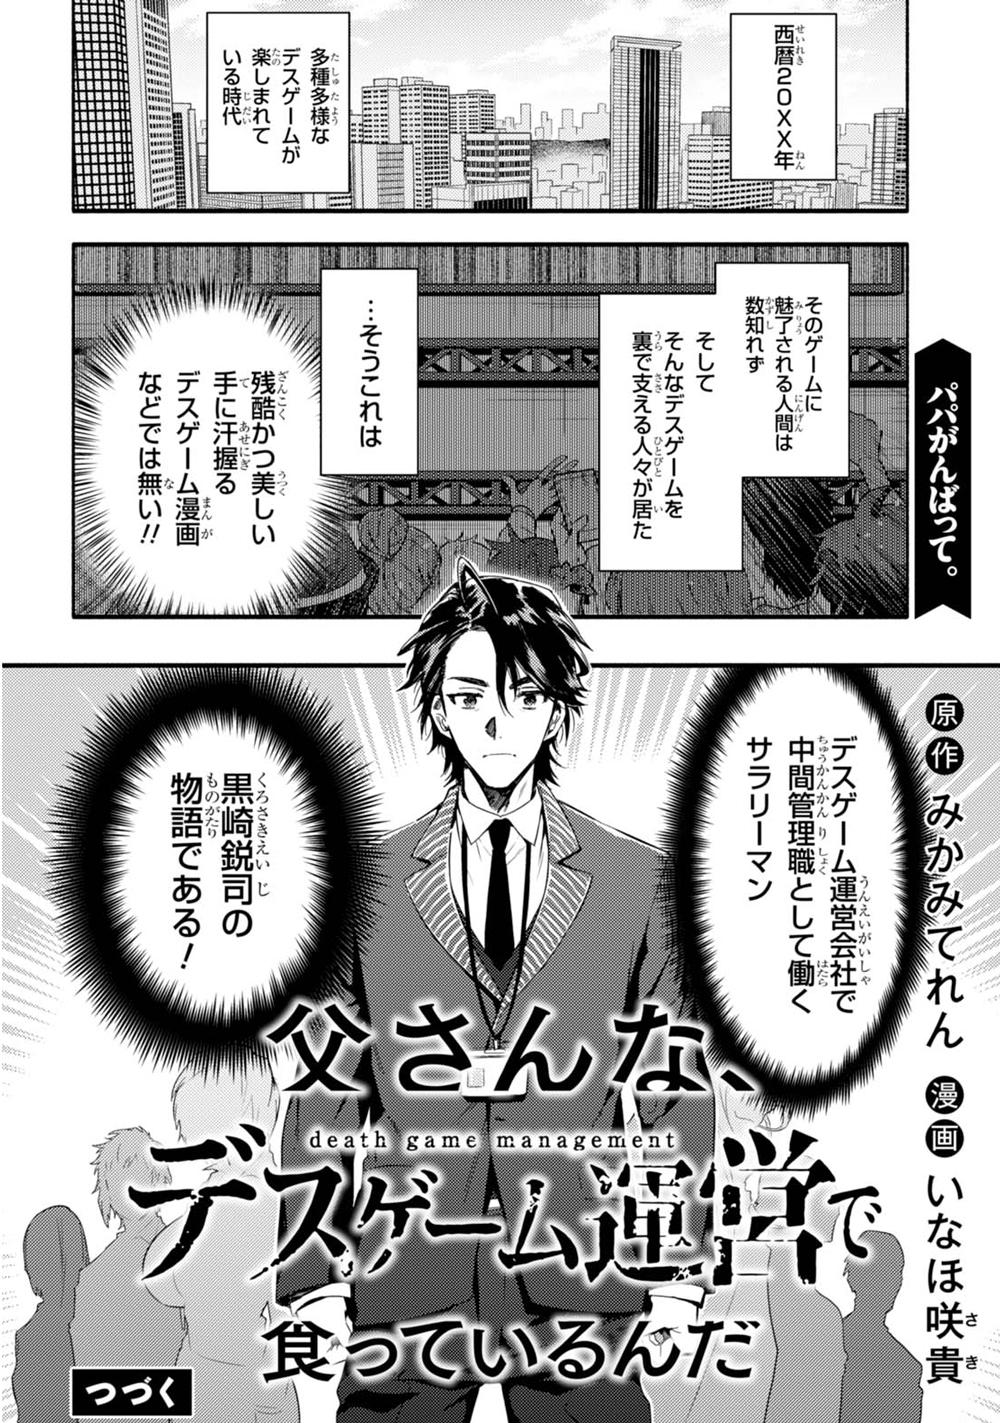 https://cdn-ak2.f.st-hatena.com/images/fotolife/k/kadokawa-toko/20170830/20170830161829.jpg